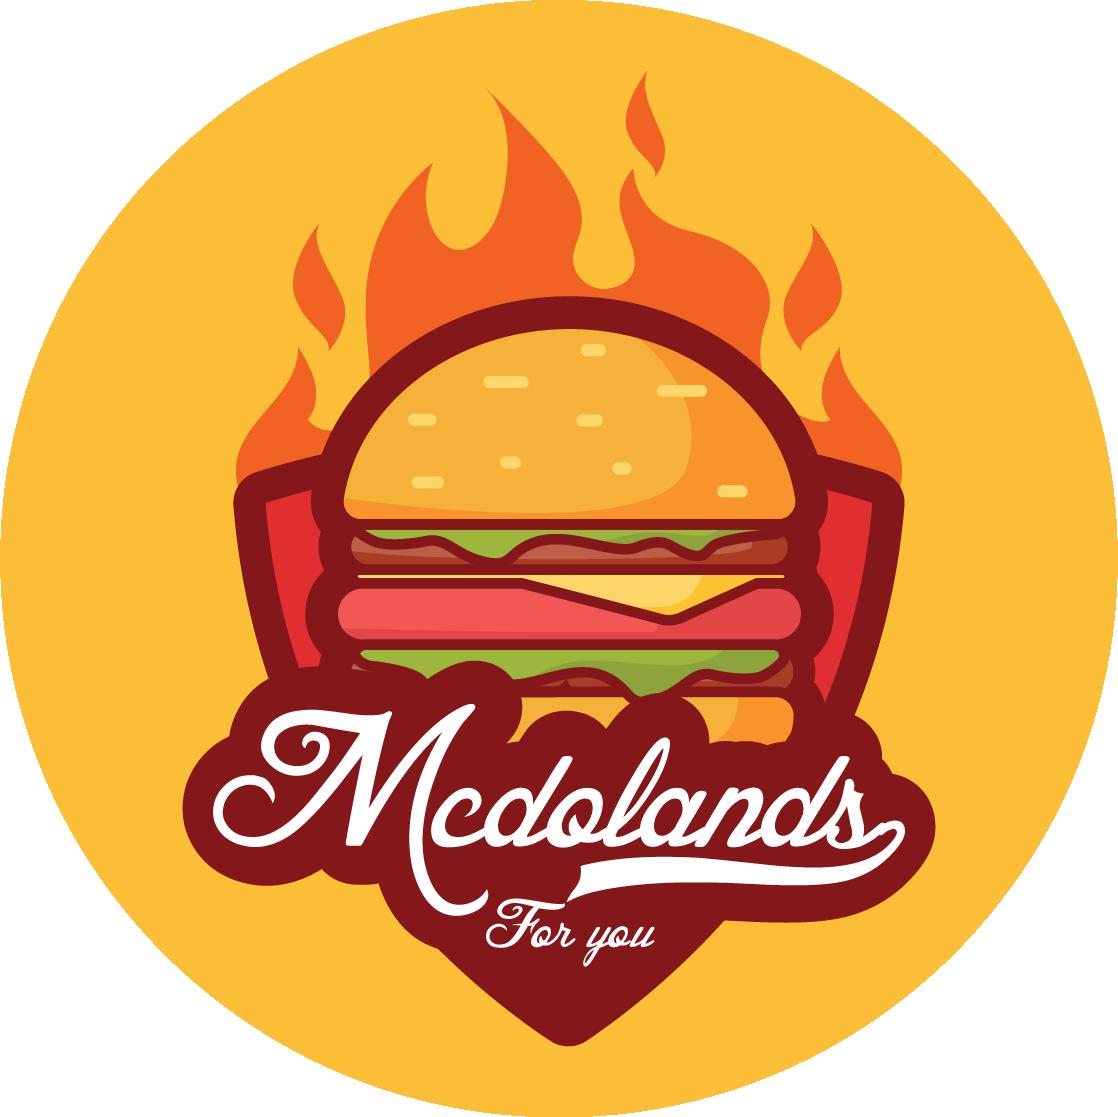 Mcdonaldsforyou